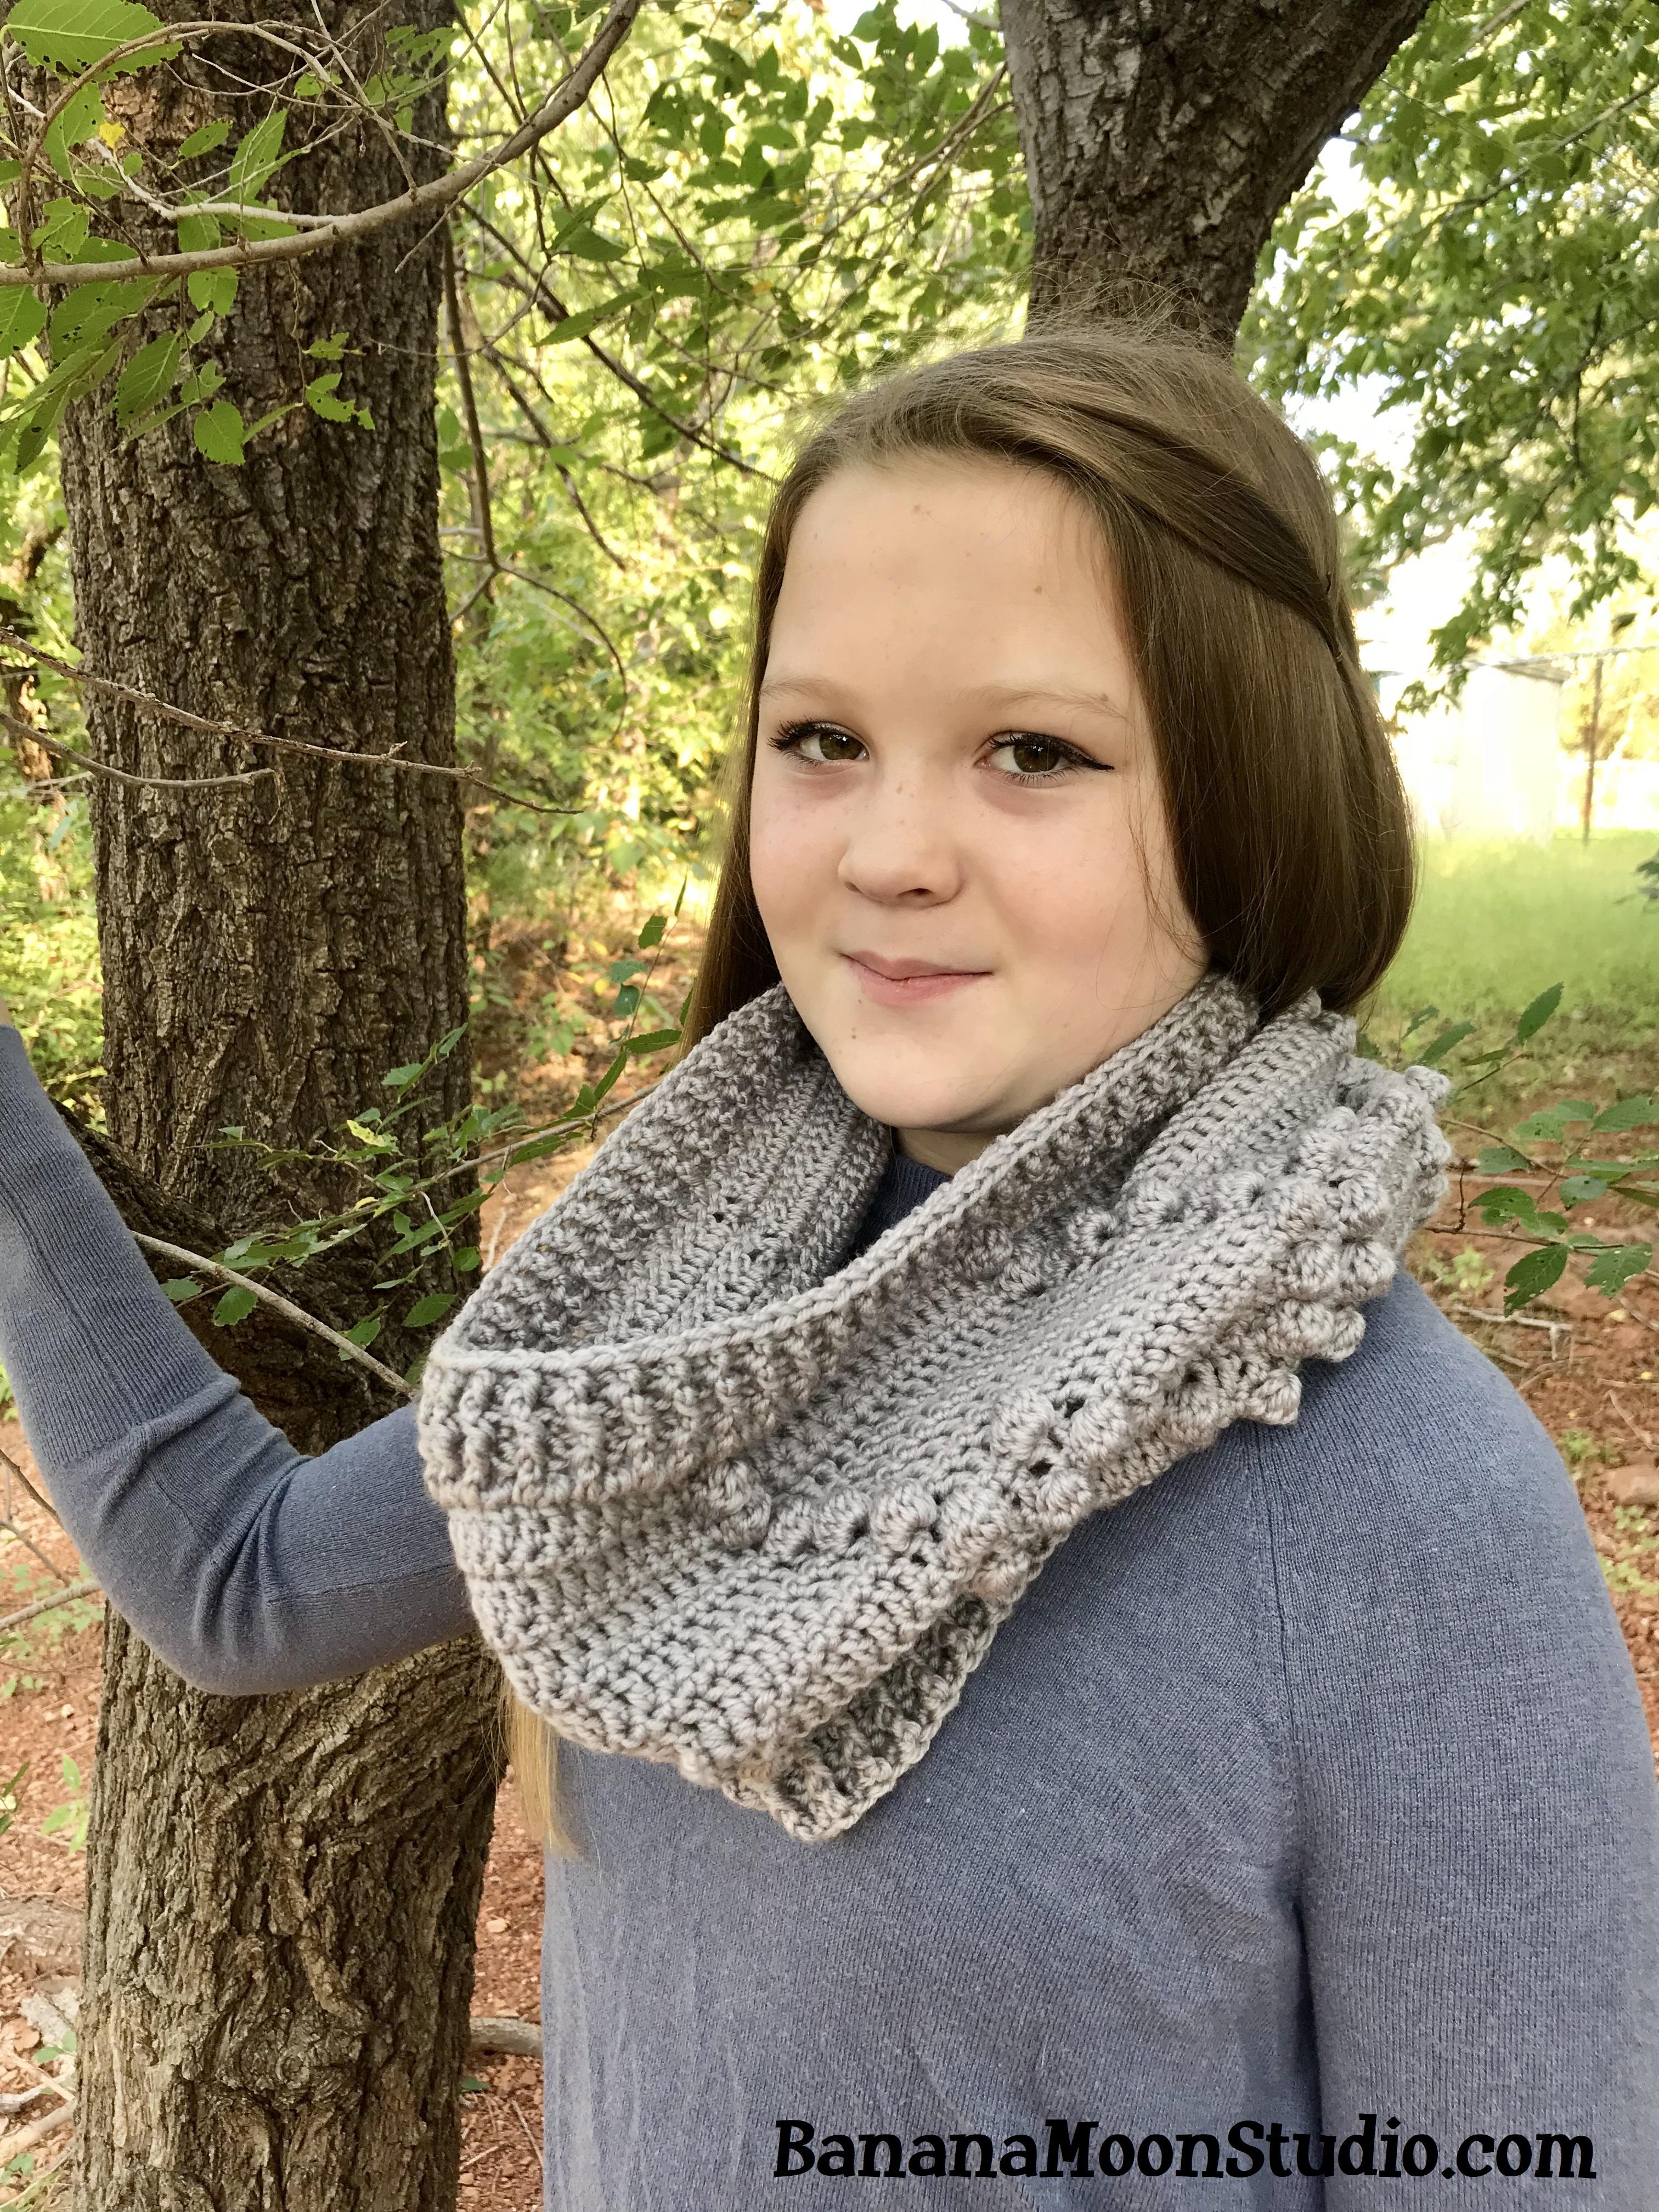 Crochet cowl in Chic Sheep yarn, pattern by April Garwood of Banana Moon Studio